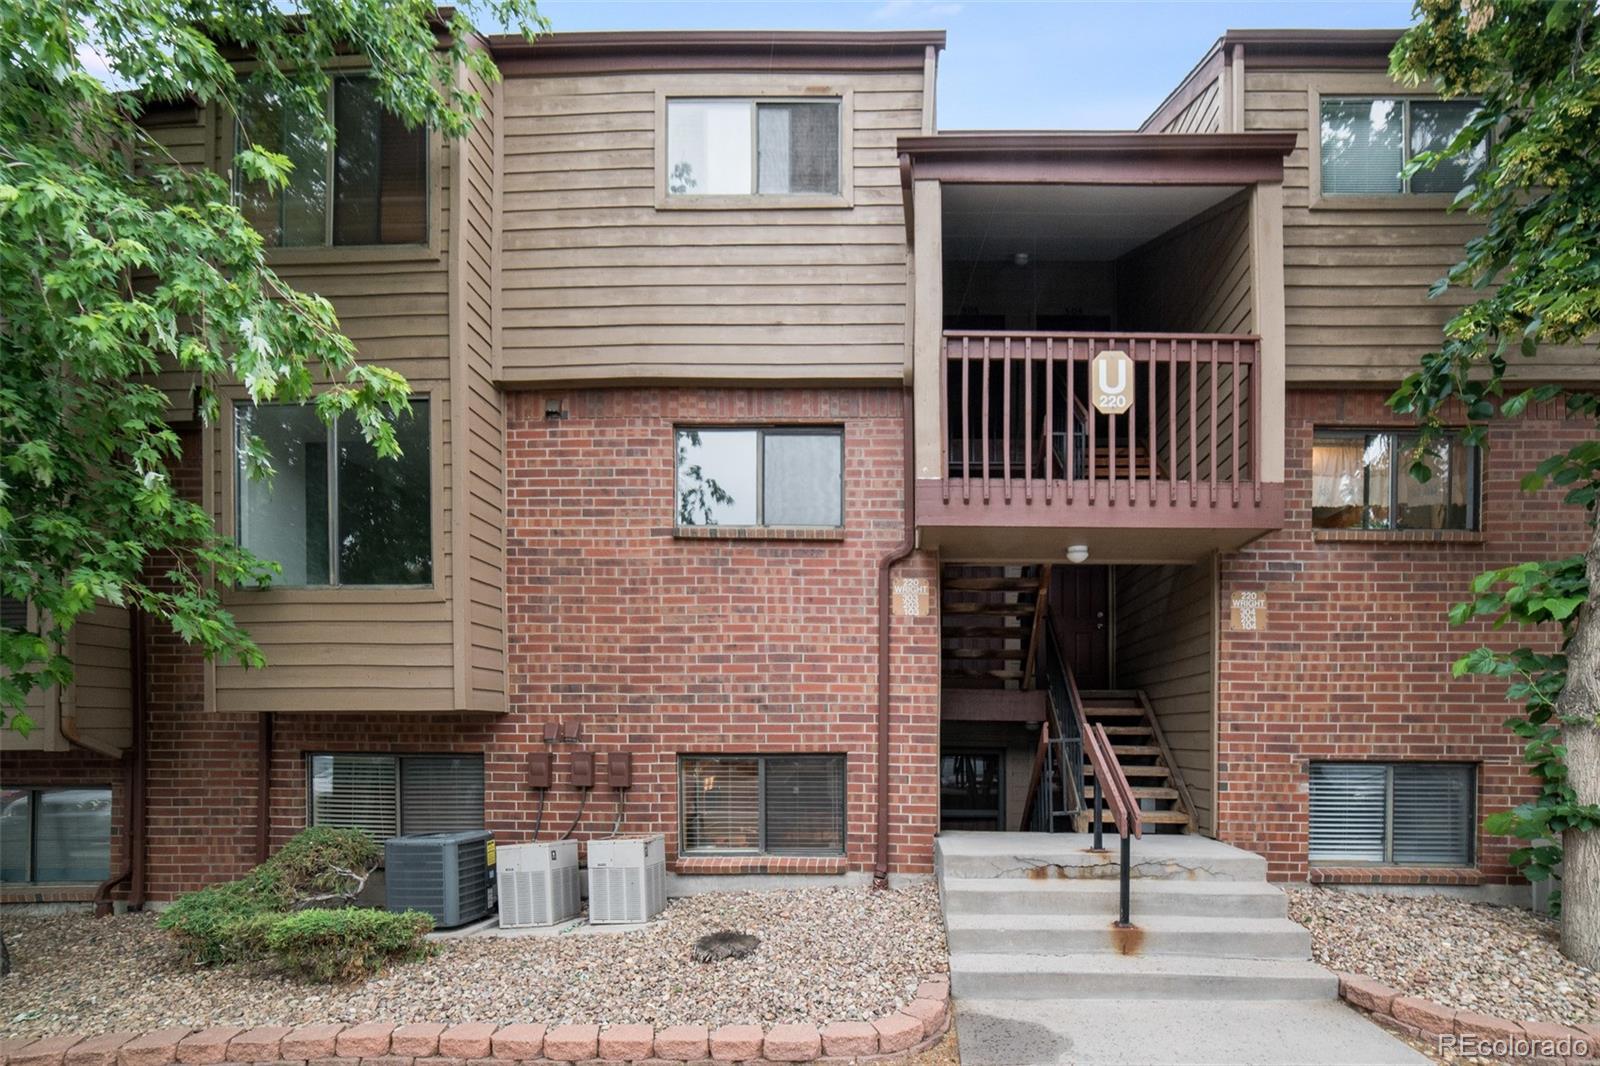 MLS# 8386467 - 21 - 220 Wright Street #203, Lakewood, CO 80228